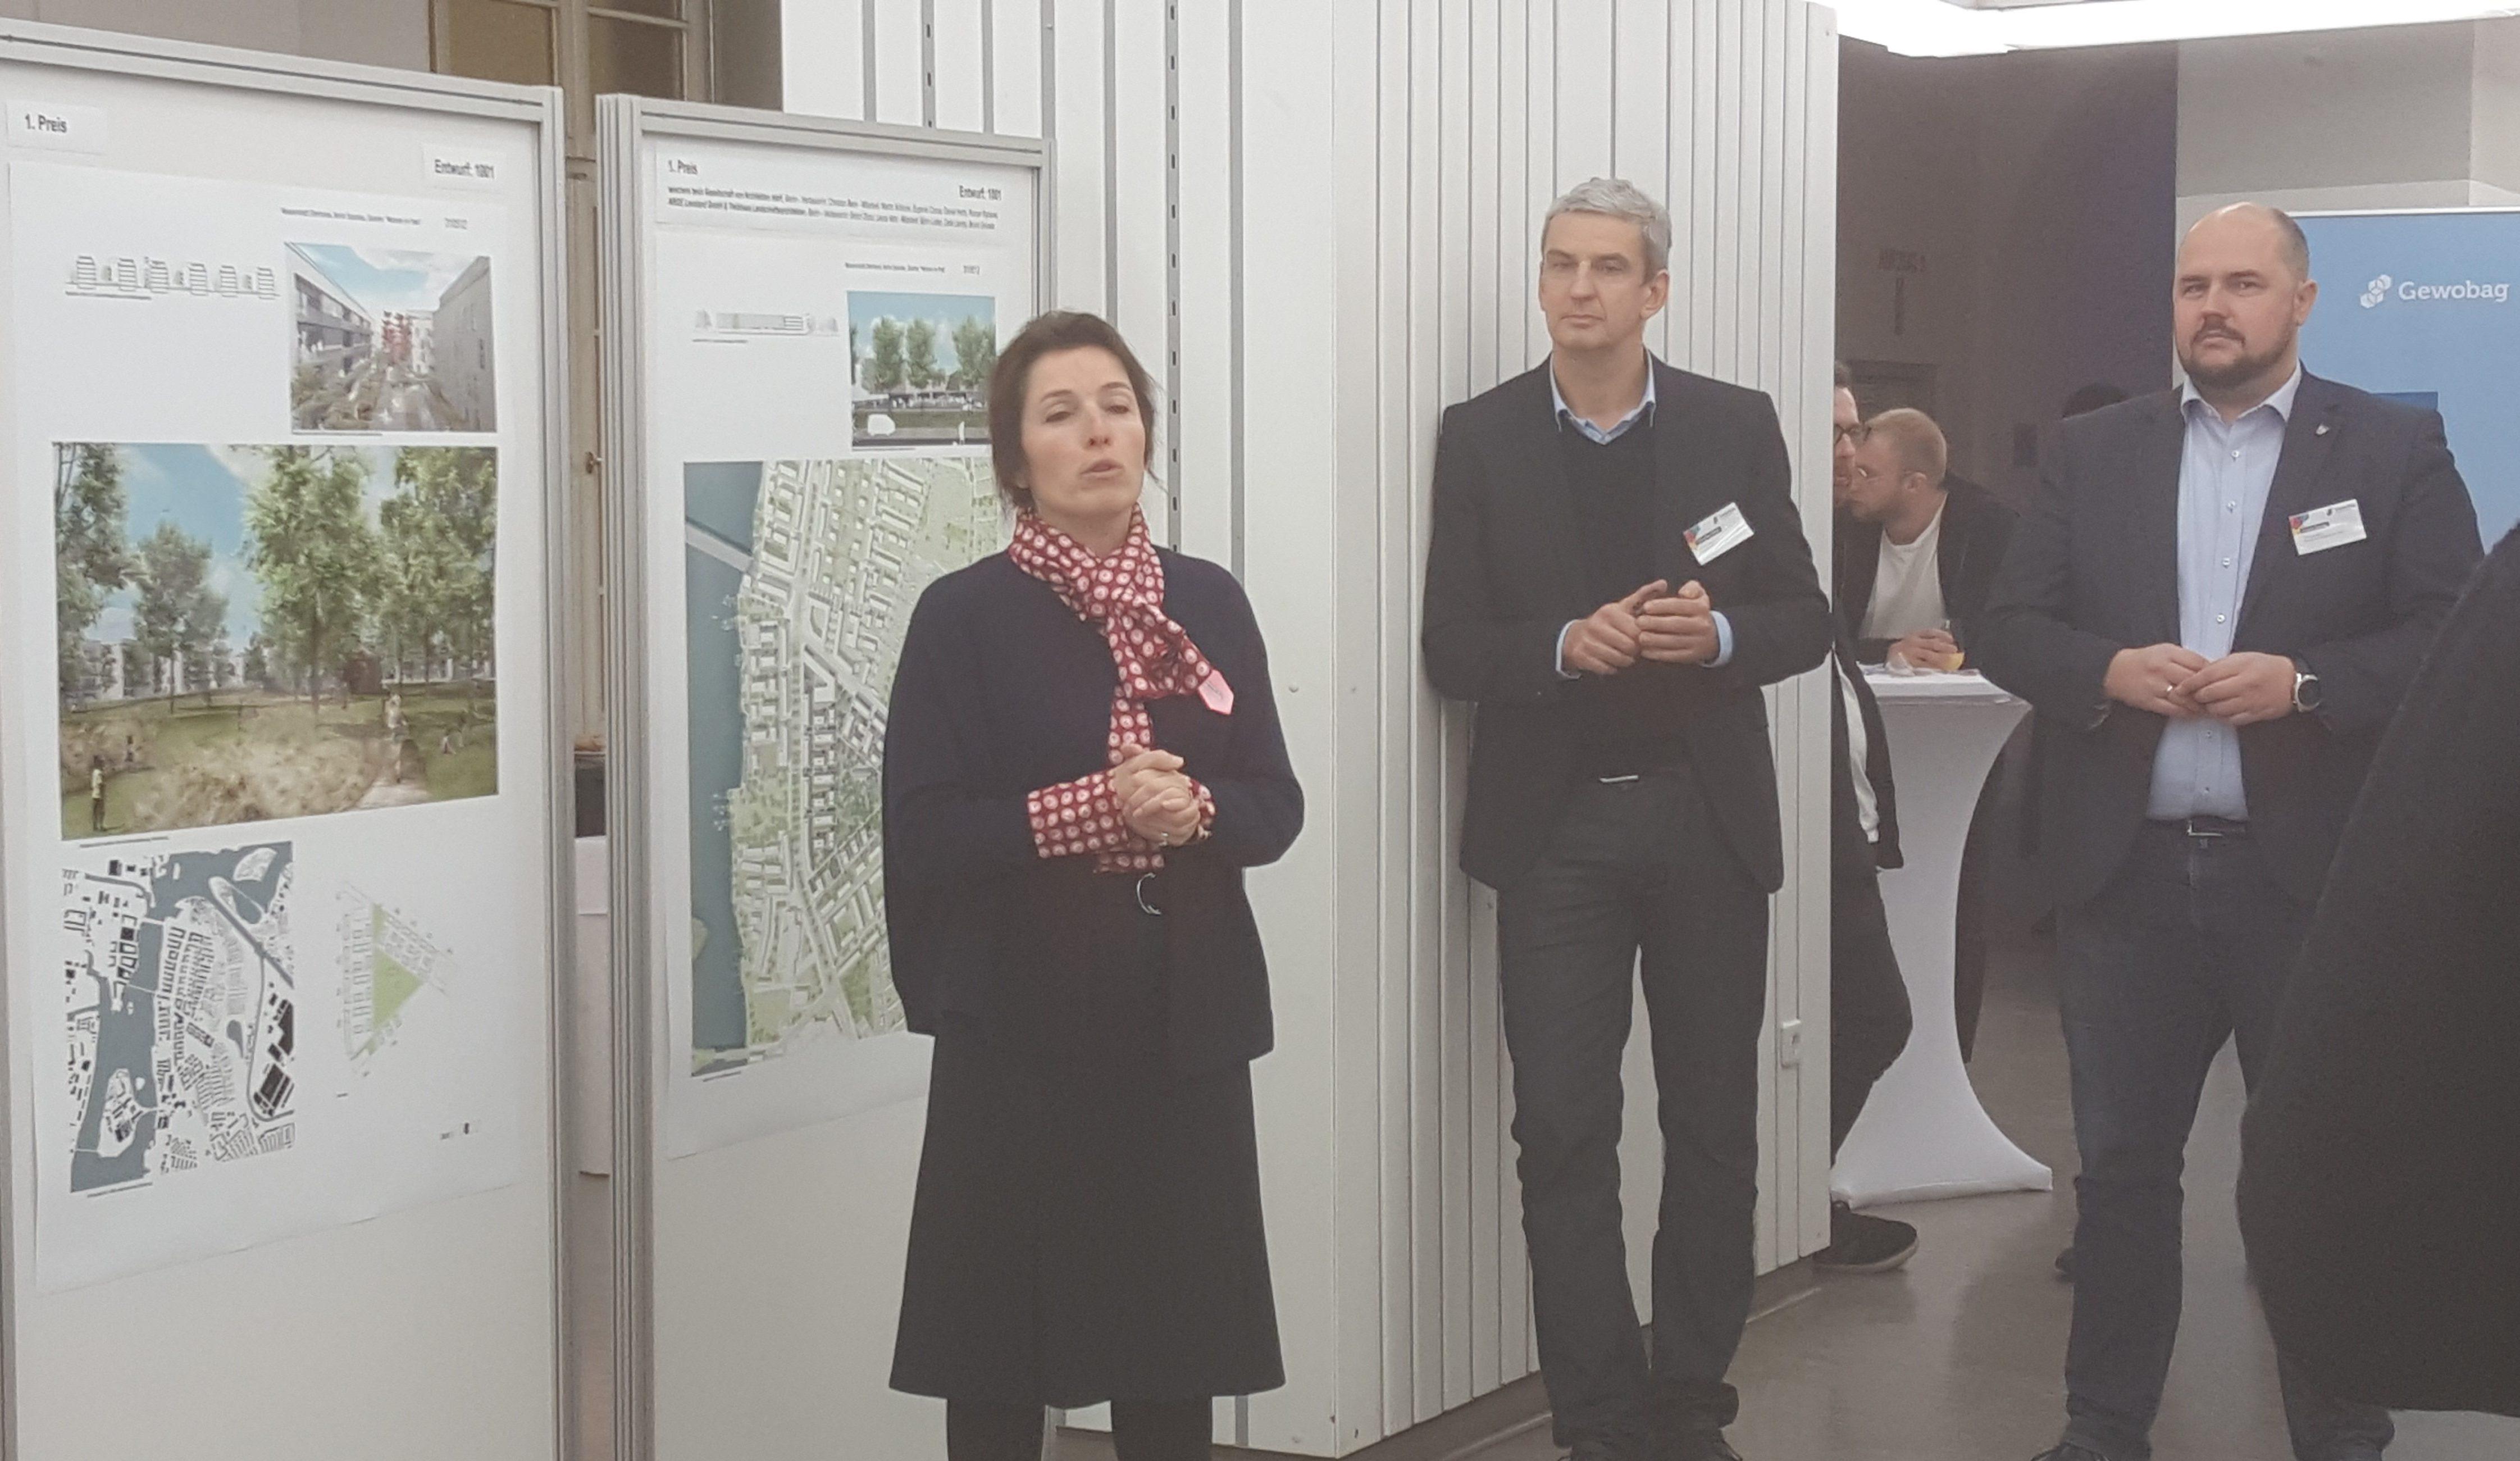 Ausstellungseröffnung zum Wettbewerb Wasserstadt Oberhavel – WATERKANT, v.l.n.r.: Snezana Michaelis (Vorstand der Gewobag), Christian Beck (wiechers beck) und Frank Bewig (Bezirksstadtrat des BA Spandau)